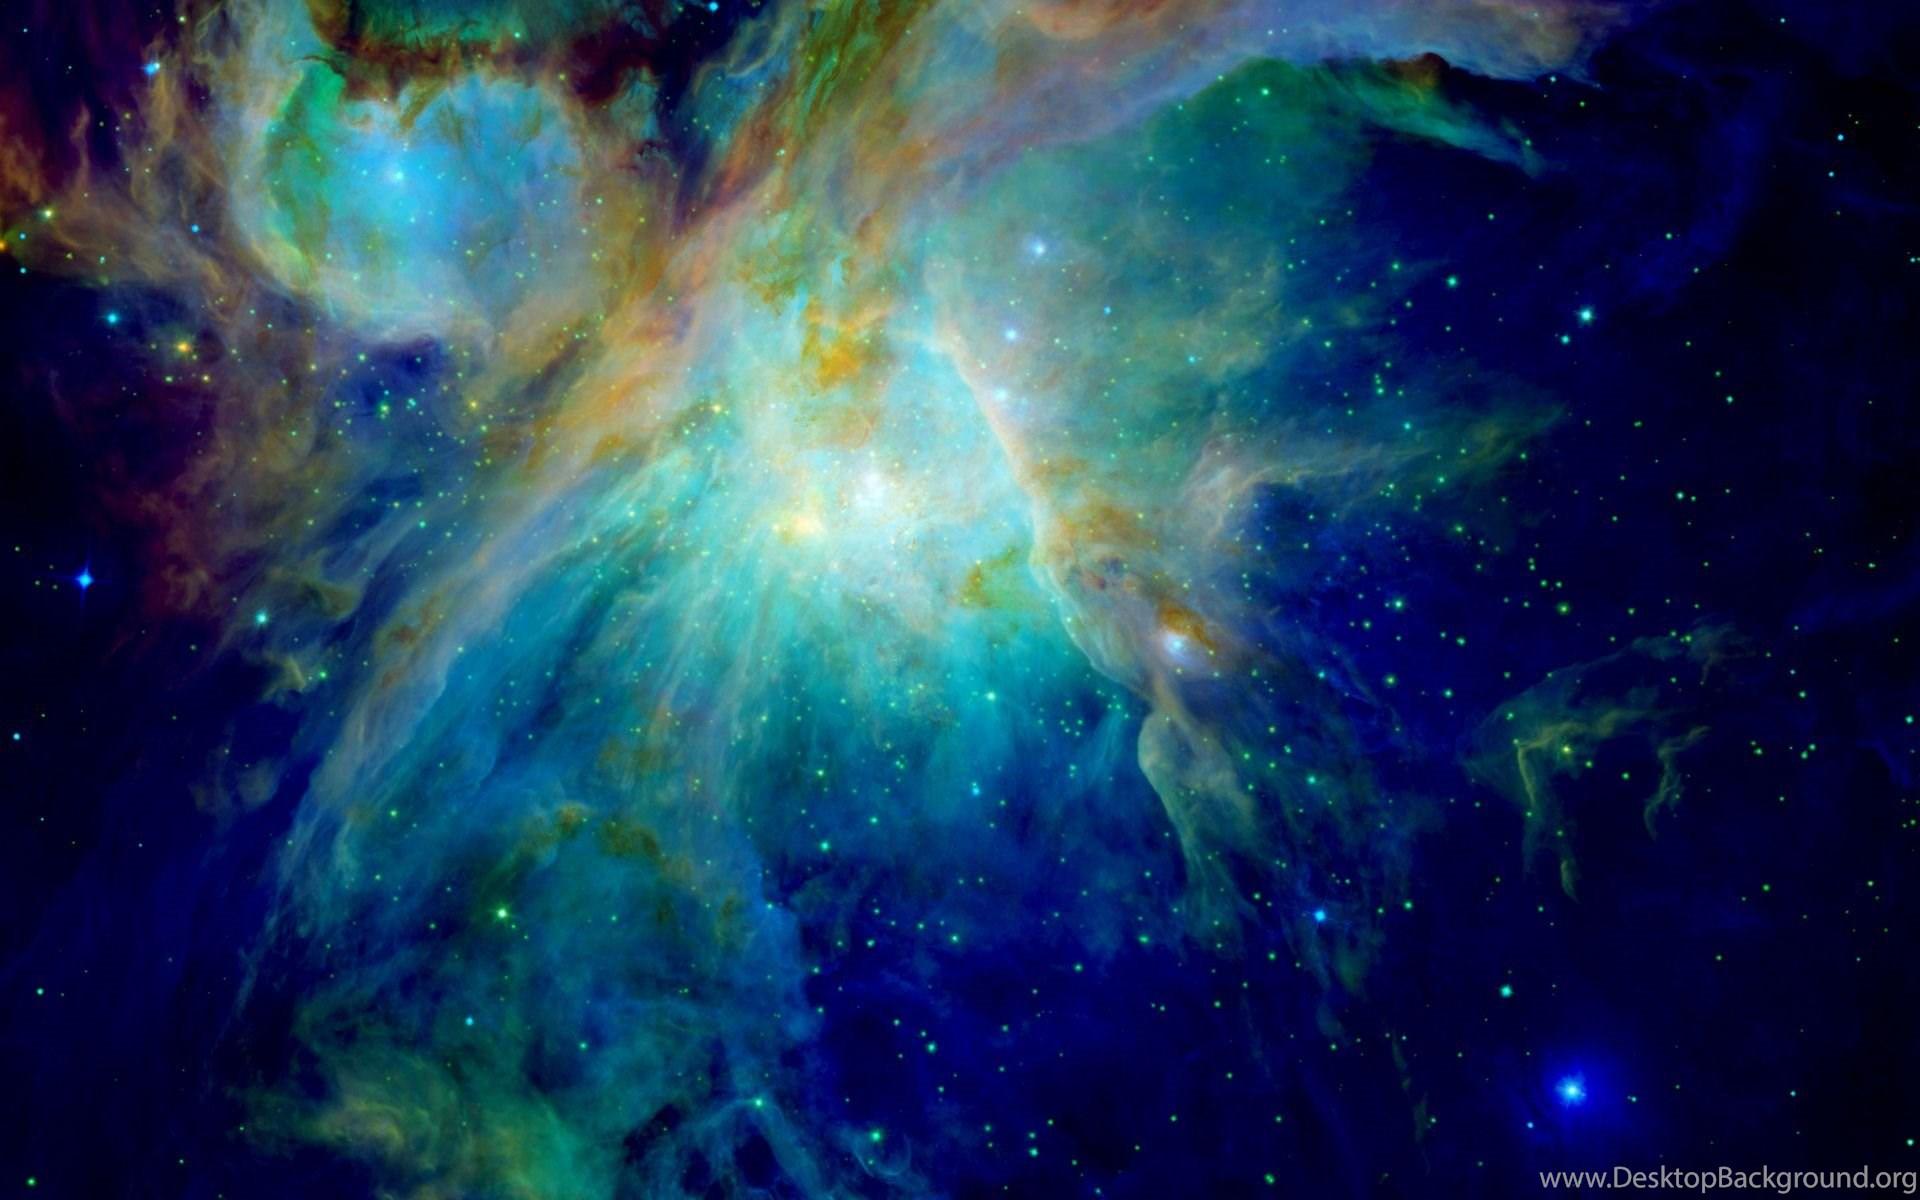 orion nebula in night sky - HD1920×1200